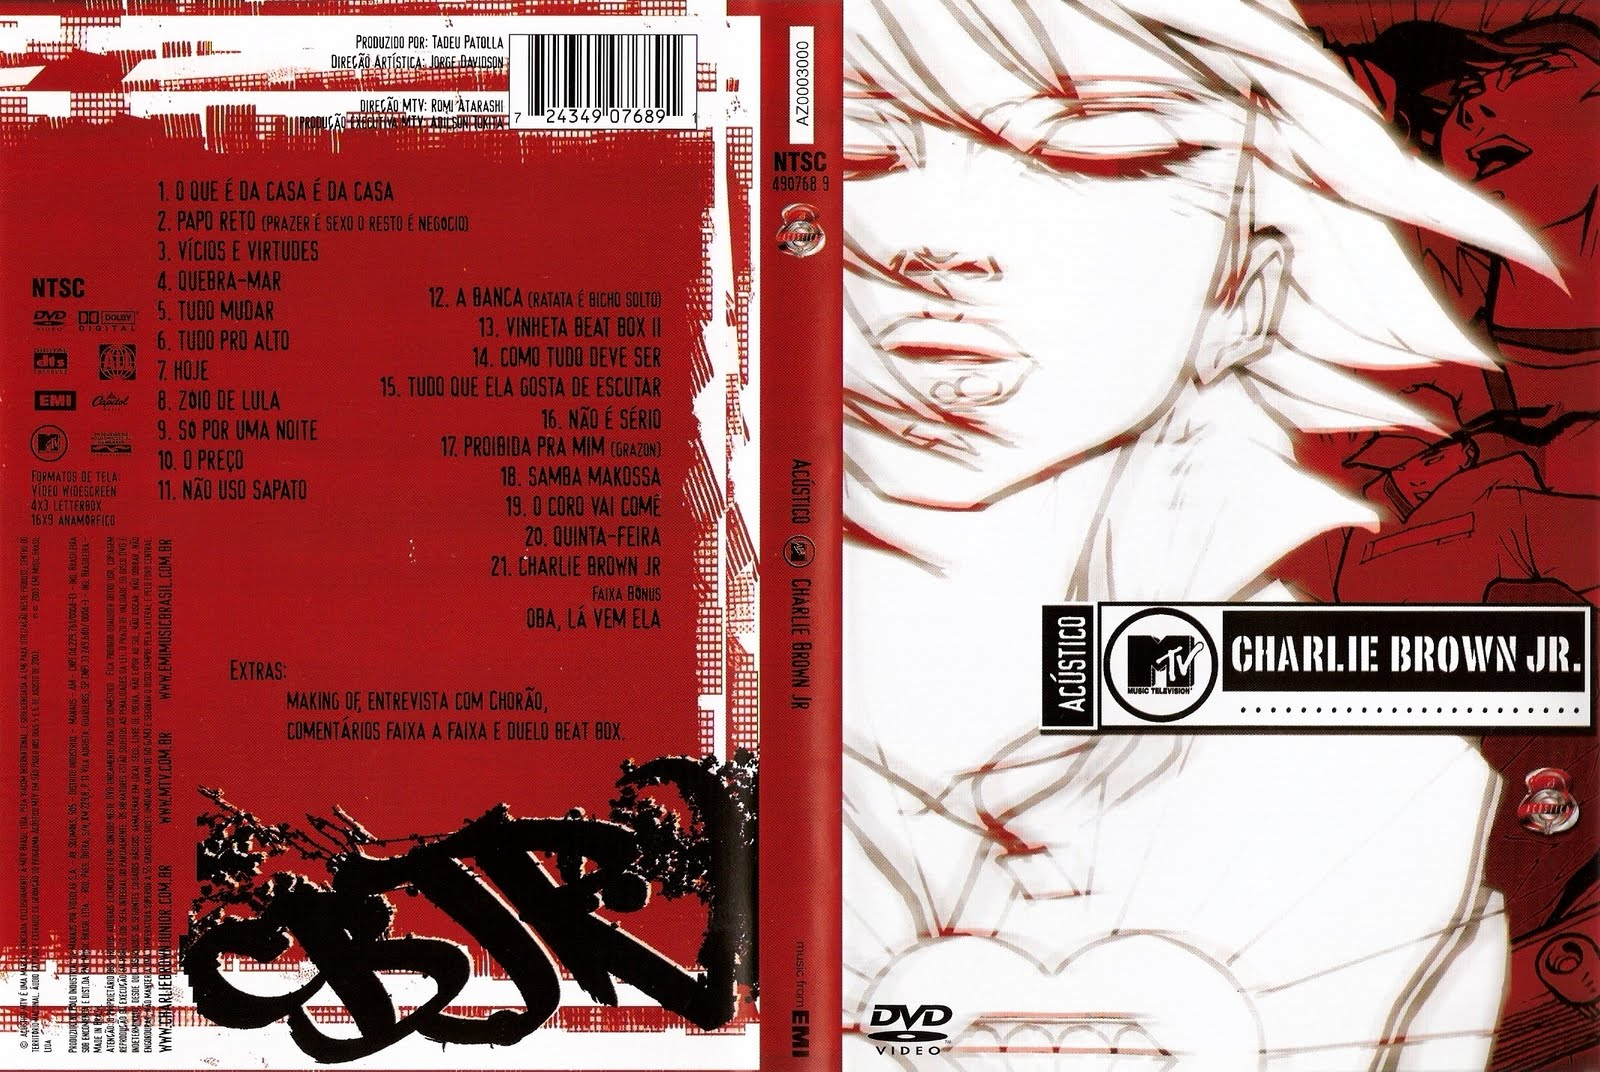 CD CHARLIE BAIXAR RITMO DO RESPONSA RITUAL JR BROWN E